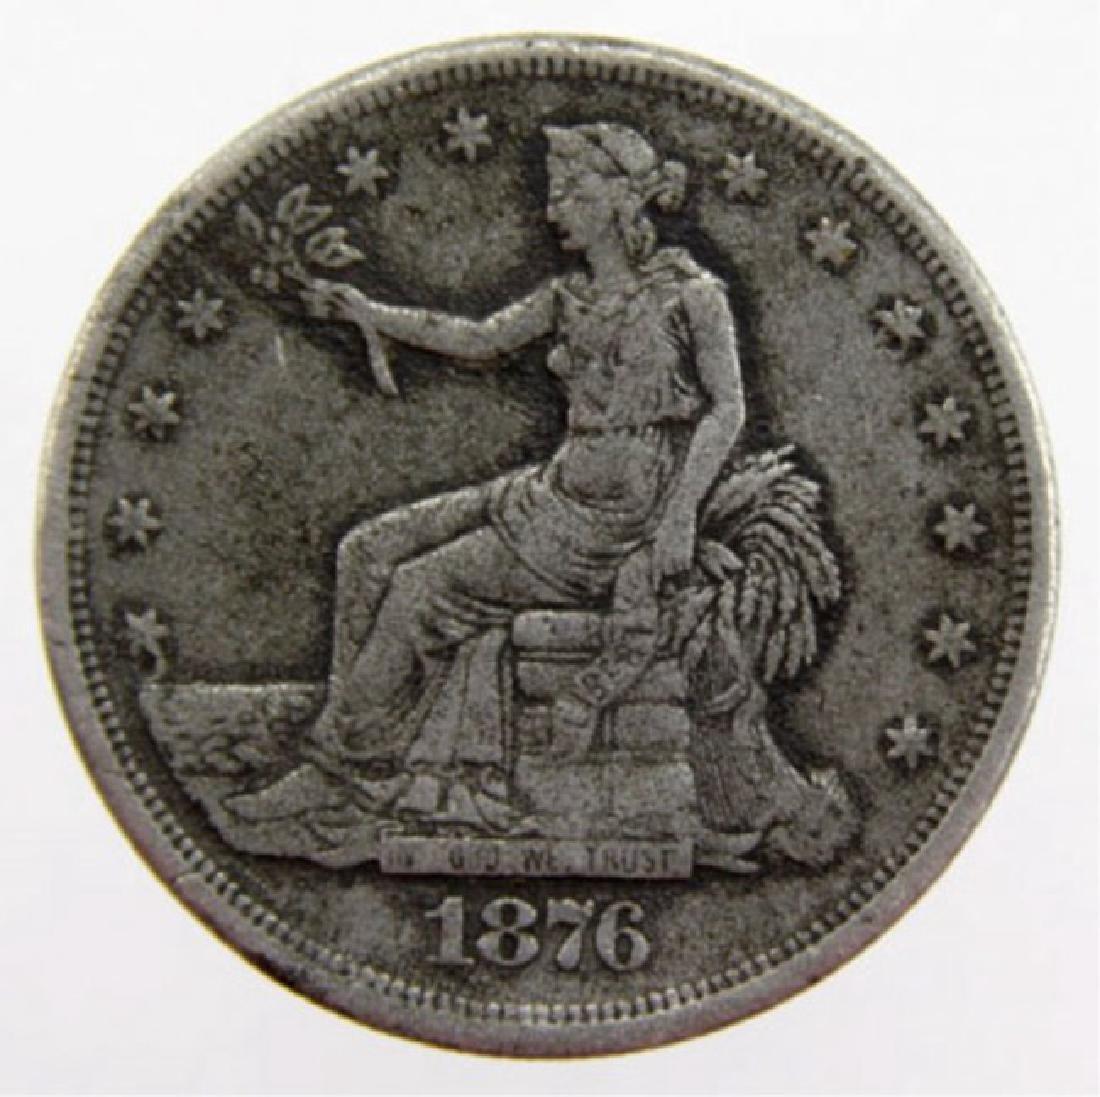 1876 US Trade Dollar RARE